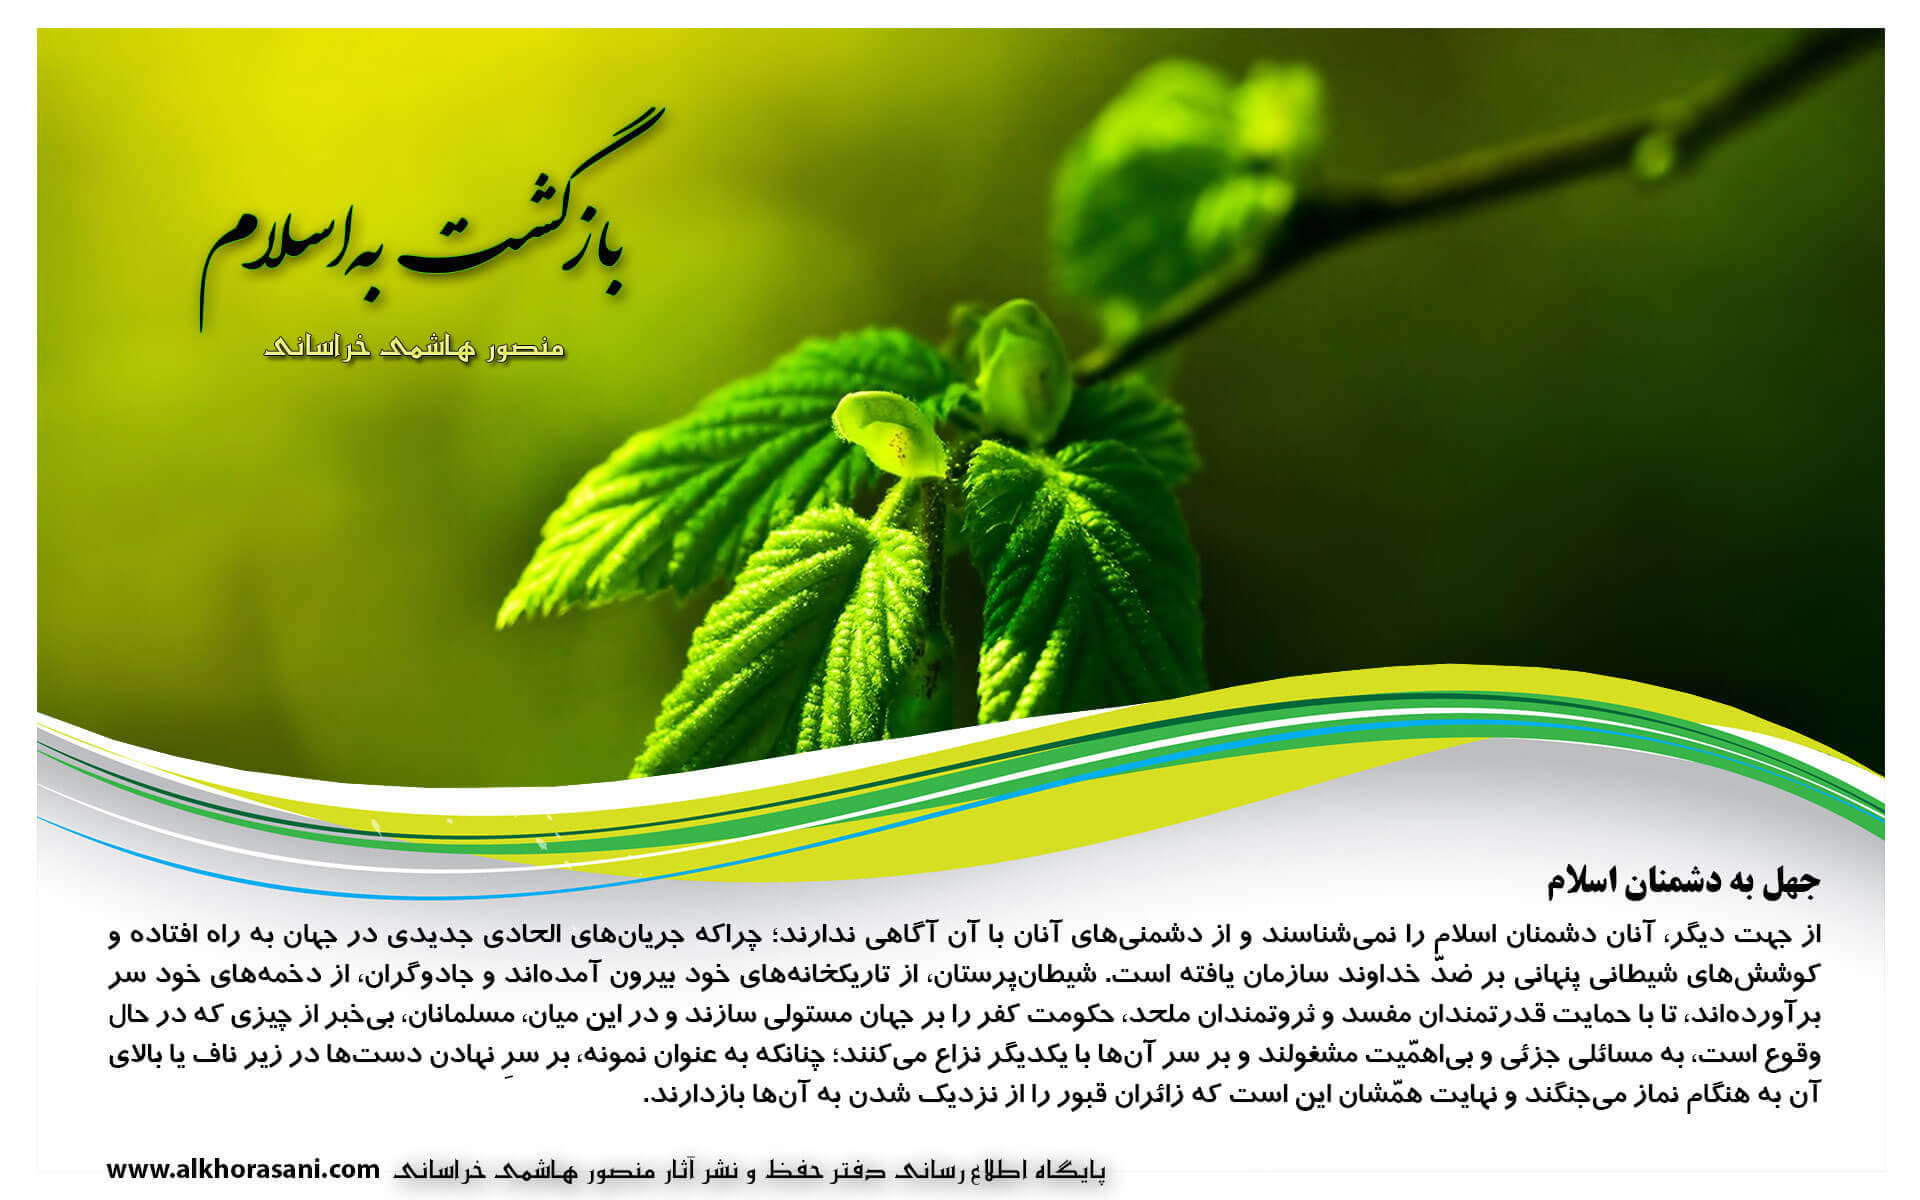 جهل به دشمنان اسلام (1)